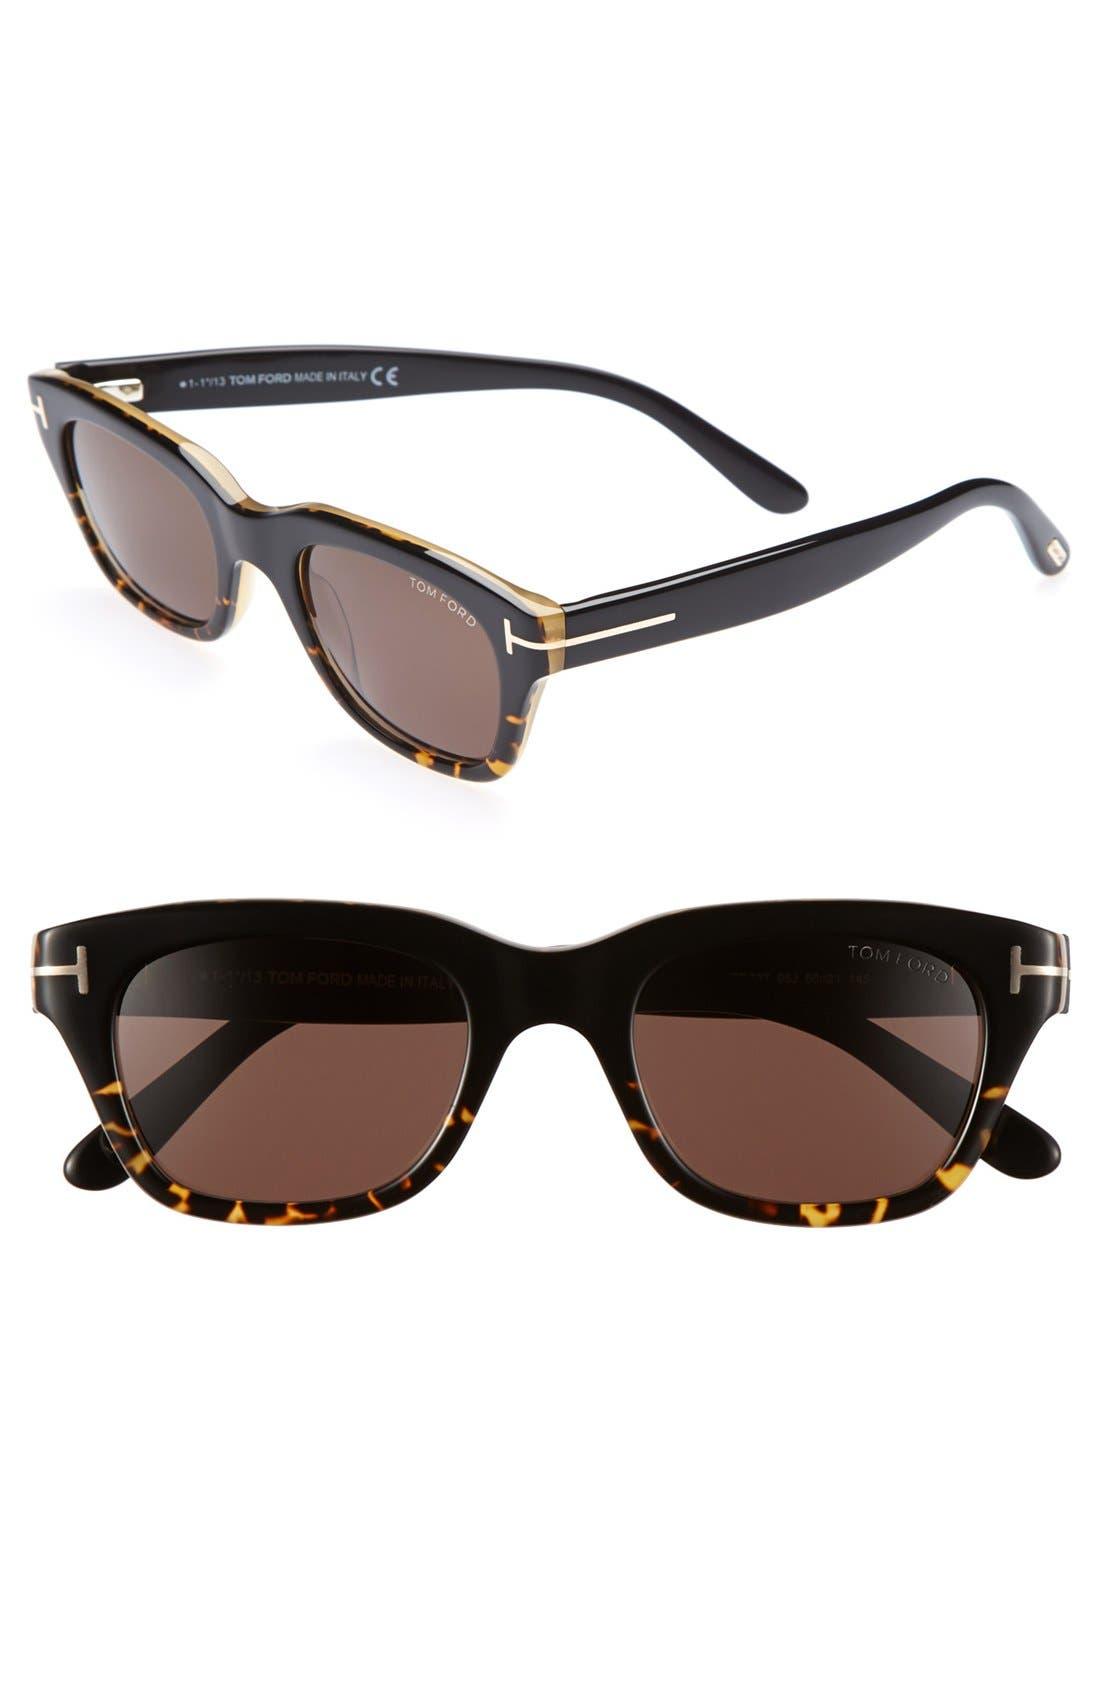 Alternate Image 1 Selected - Tom Ford 'Snowdon' 50mm Sunglasses